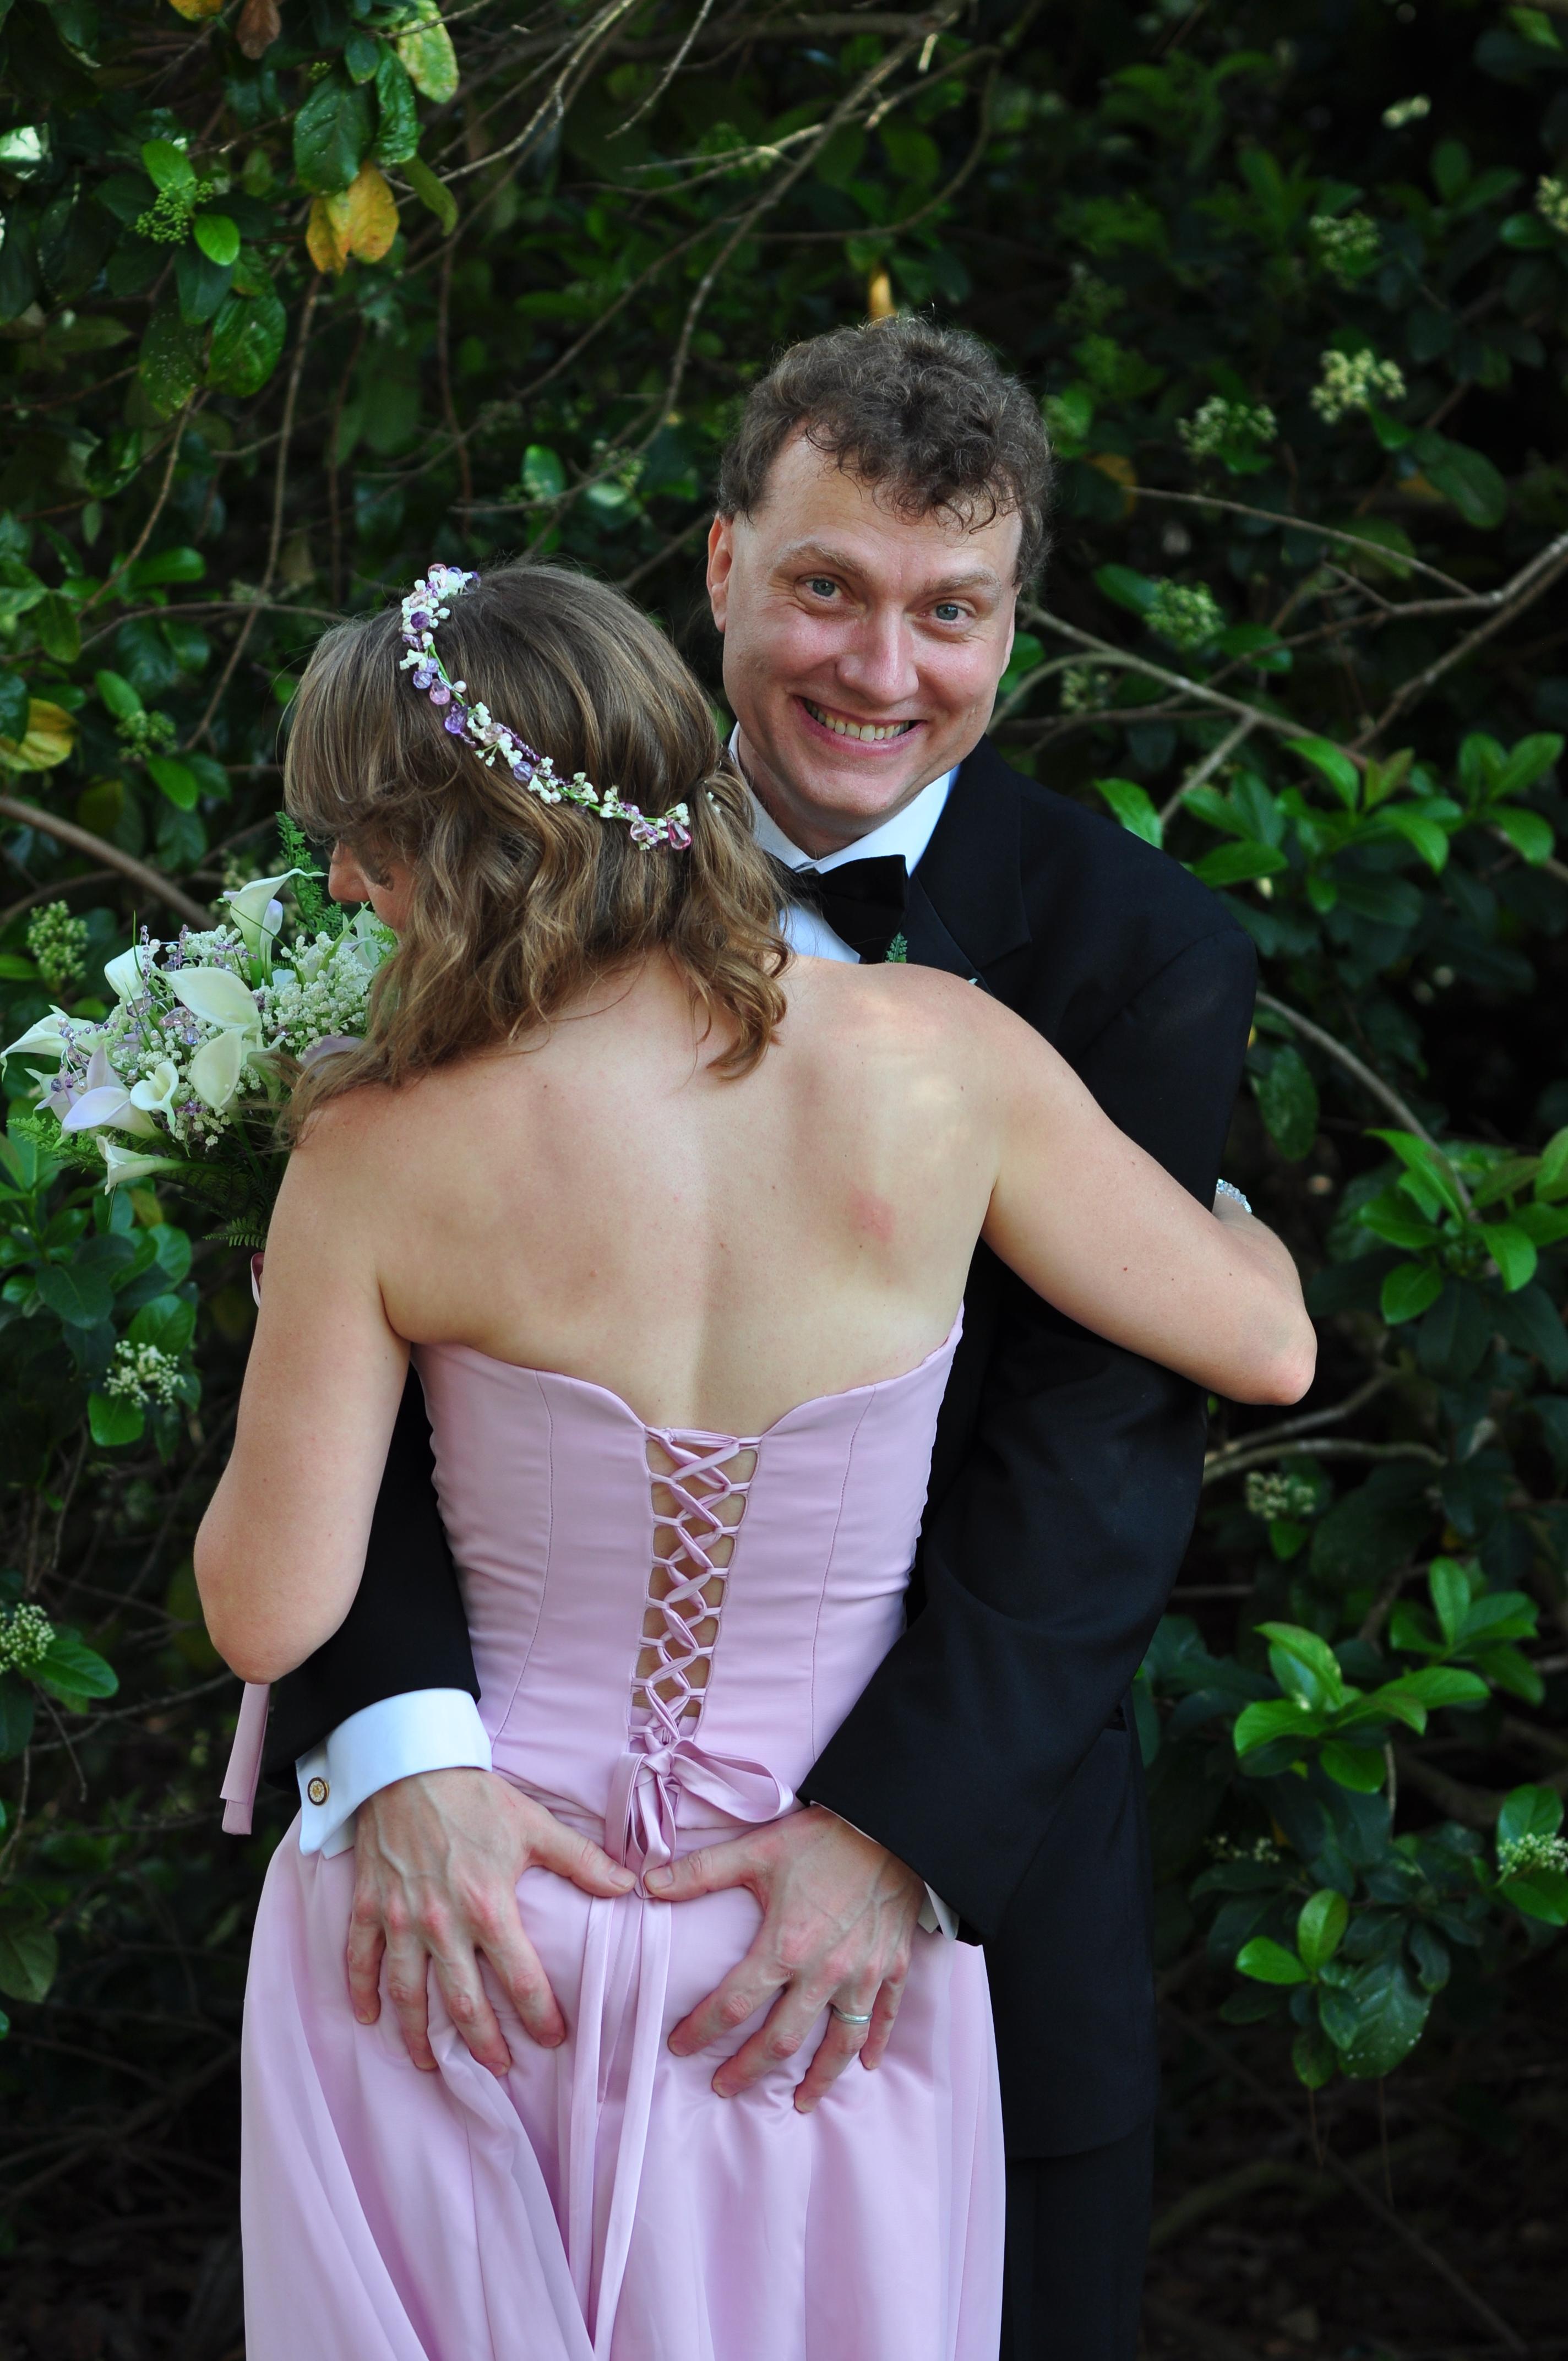 emily-and-travis-4-1-2013-april-fools-wedding-437